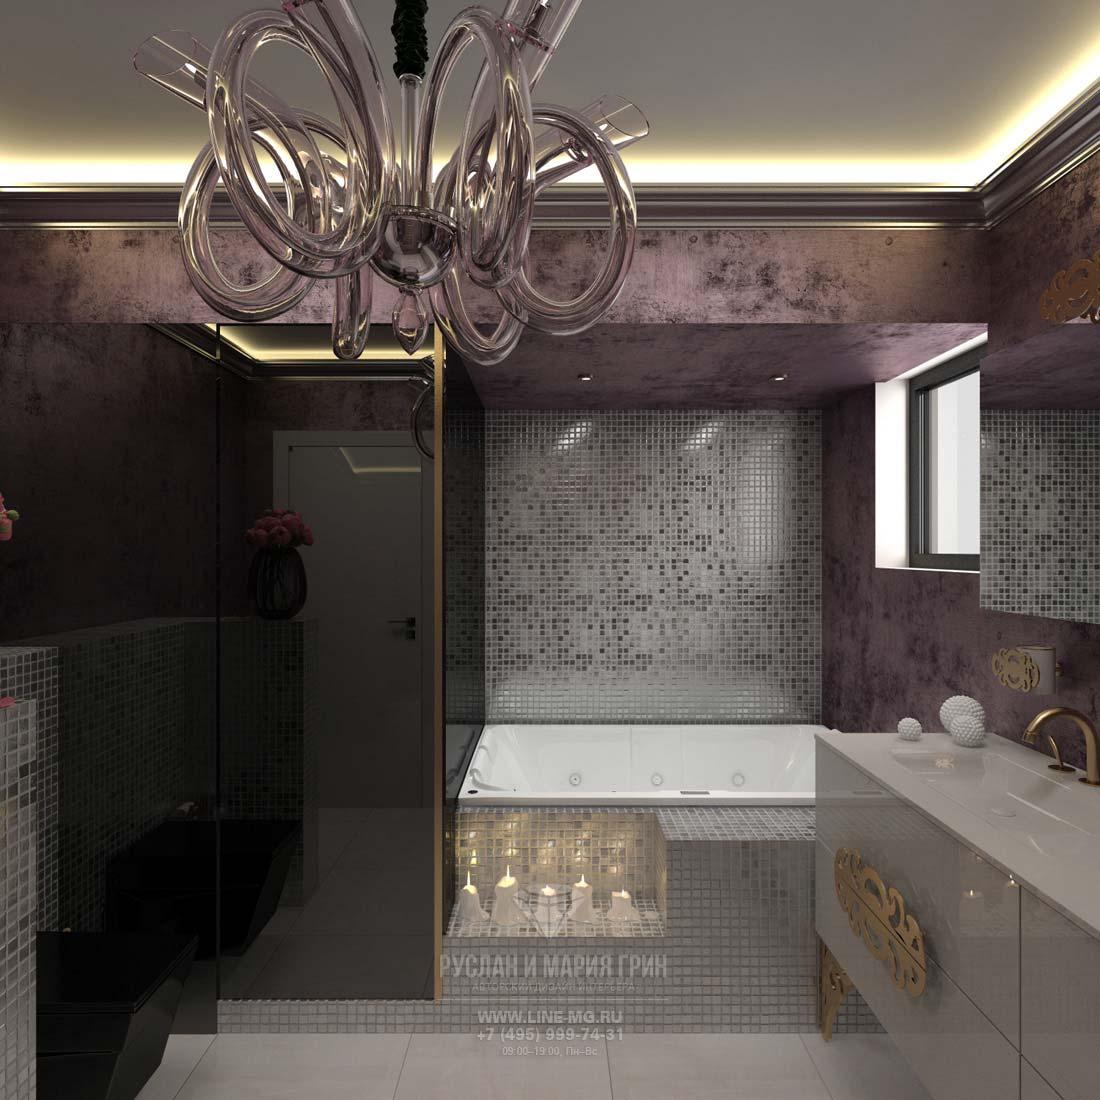 Дизайн ванной комнаты: фото